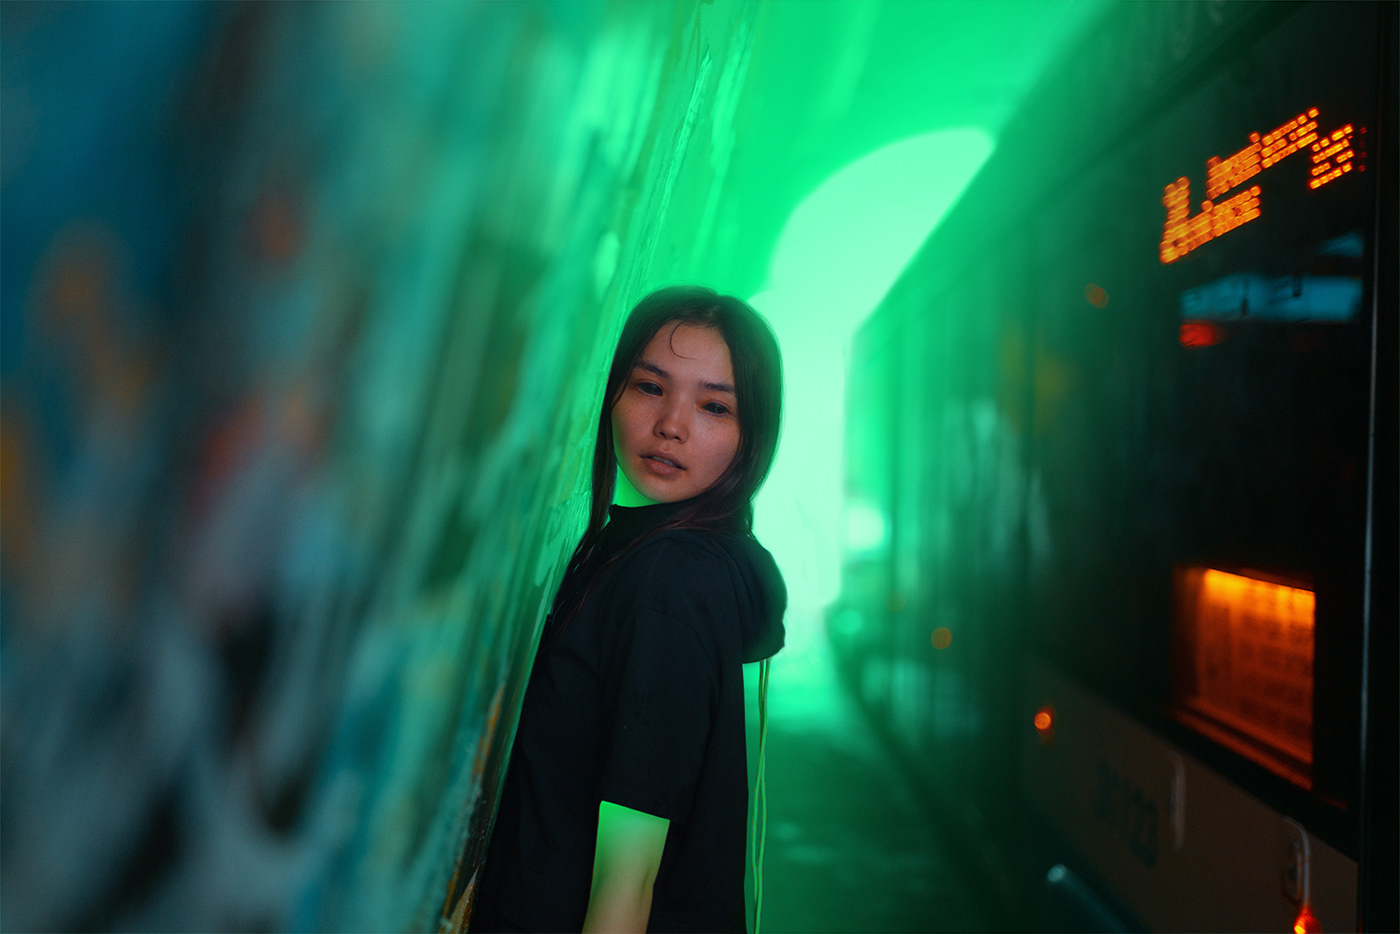 Cyberpunk,Cyborg,future,Russia,neon,glow,girl,car,brand,wear